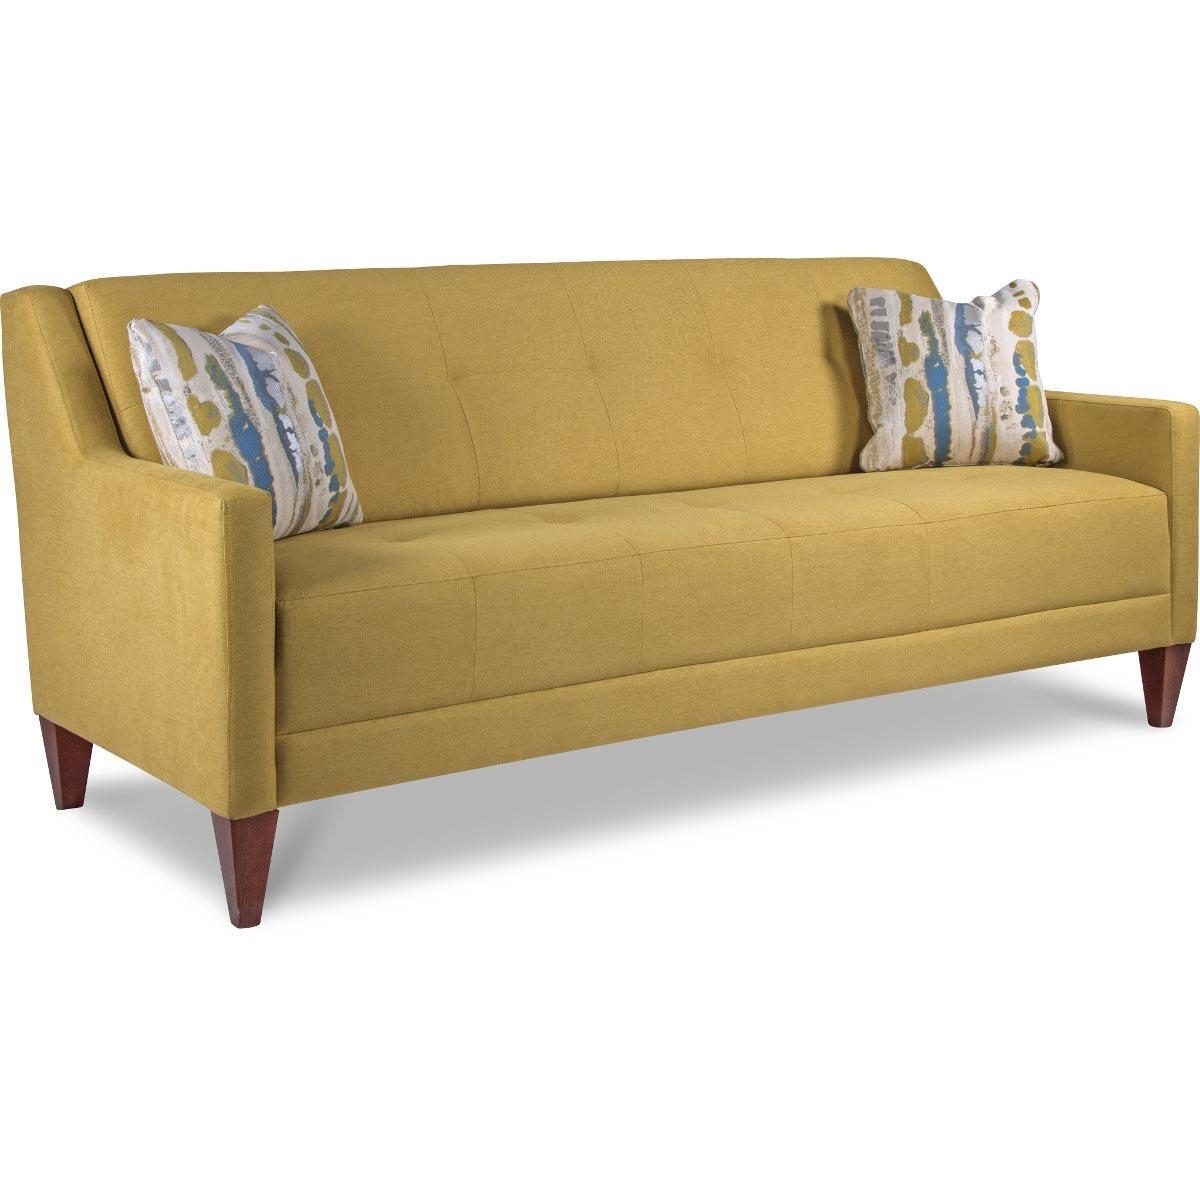 Verve Premier Sofa Throughout Lazy Boy Sofas (View 9 of 20)